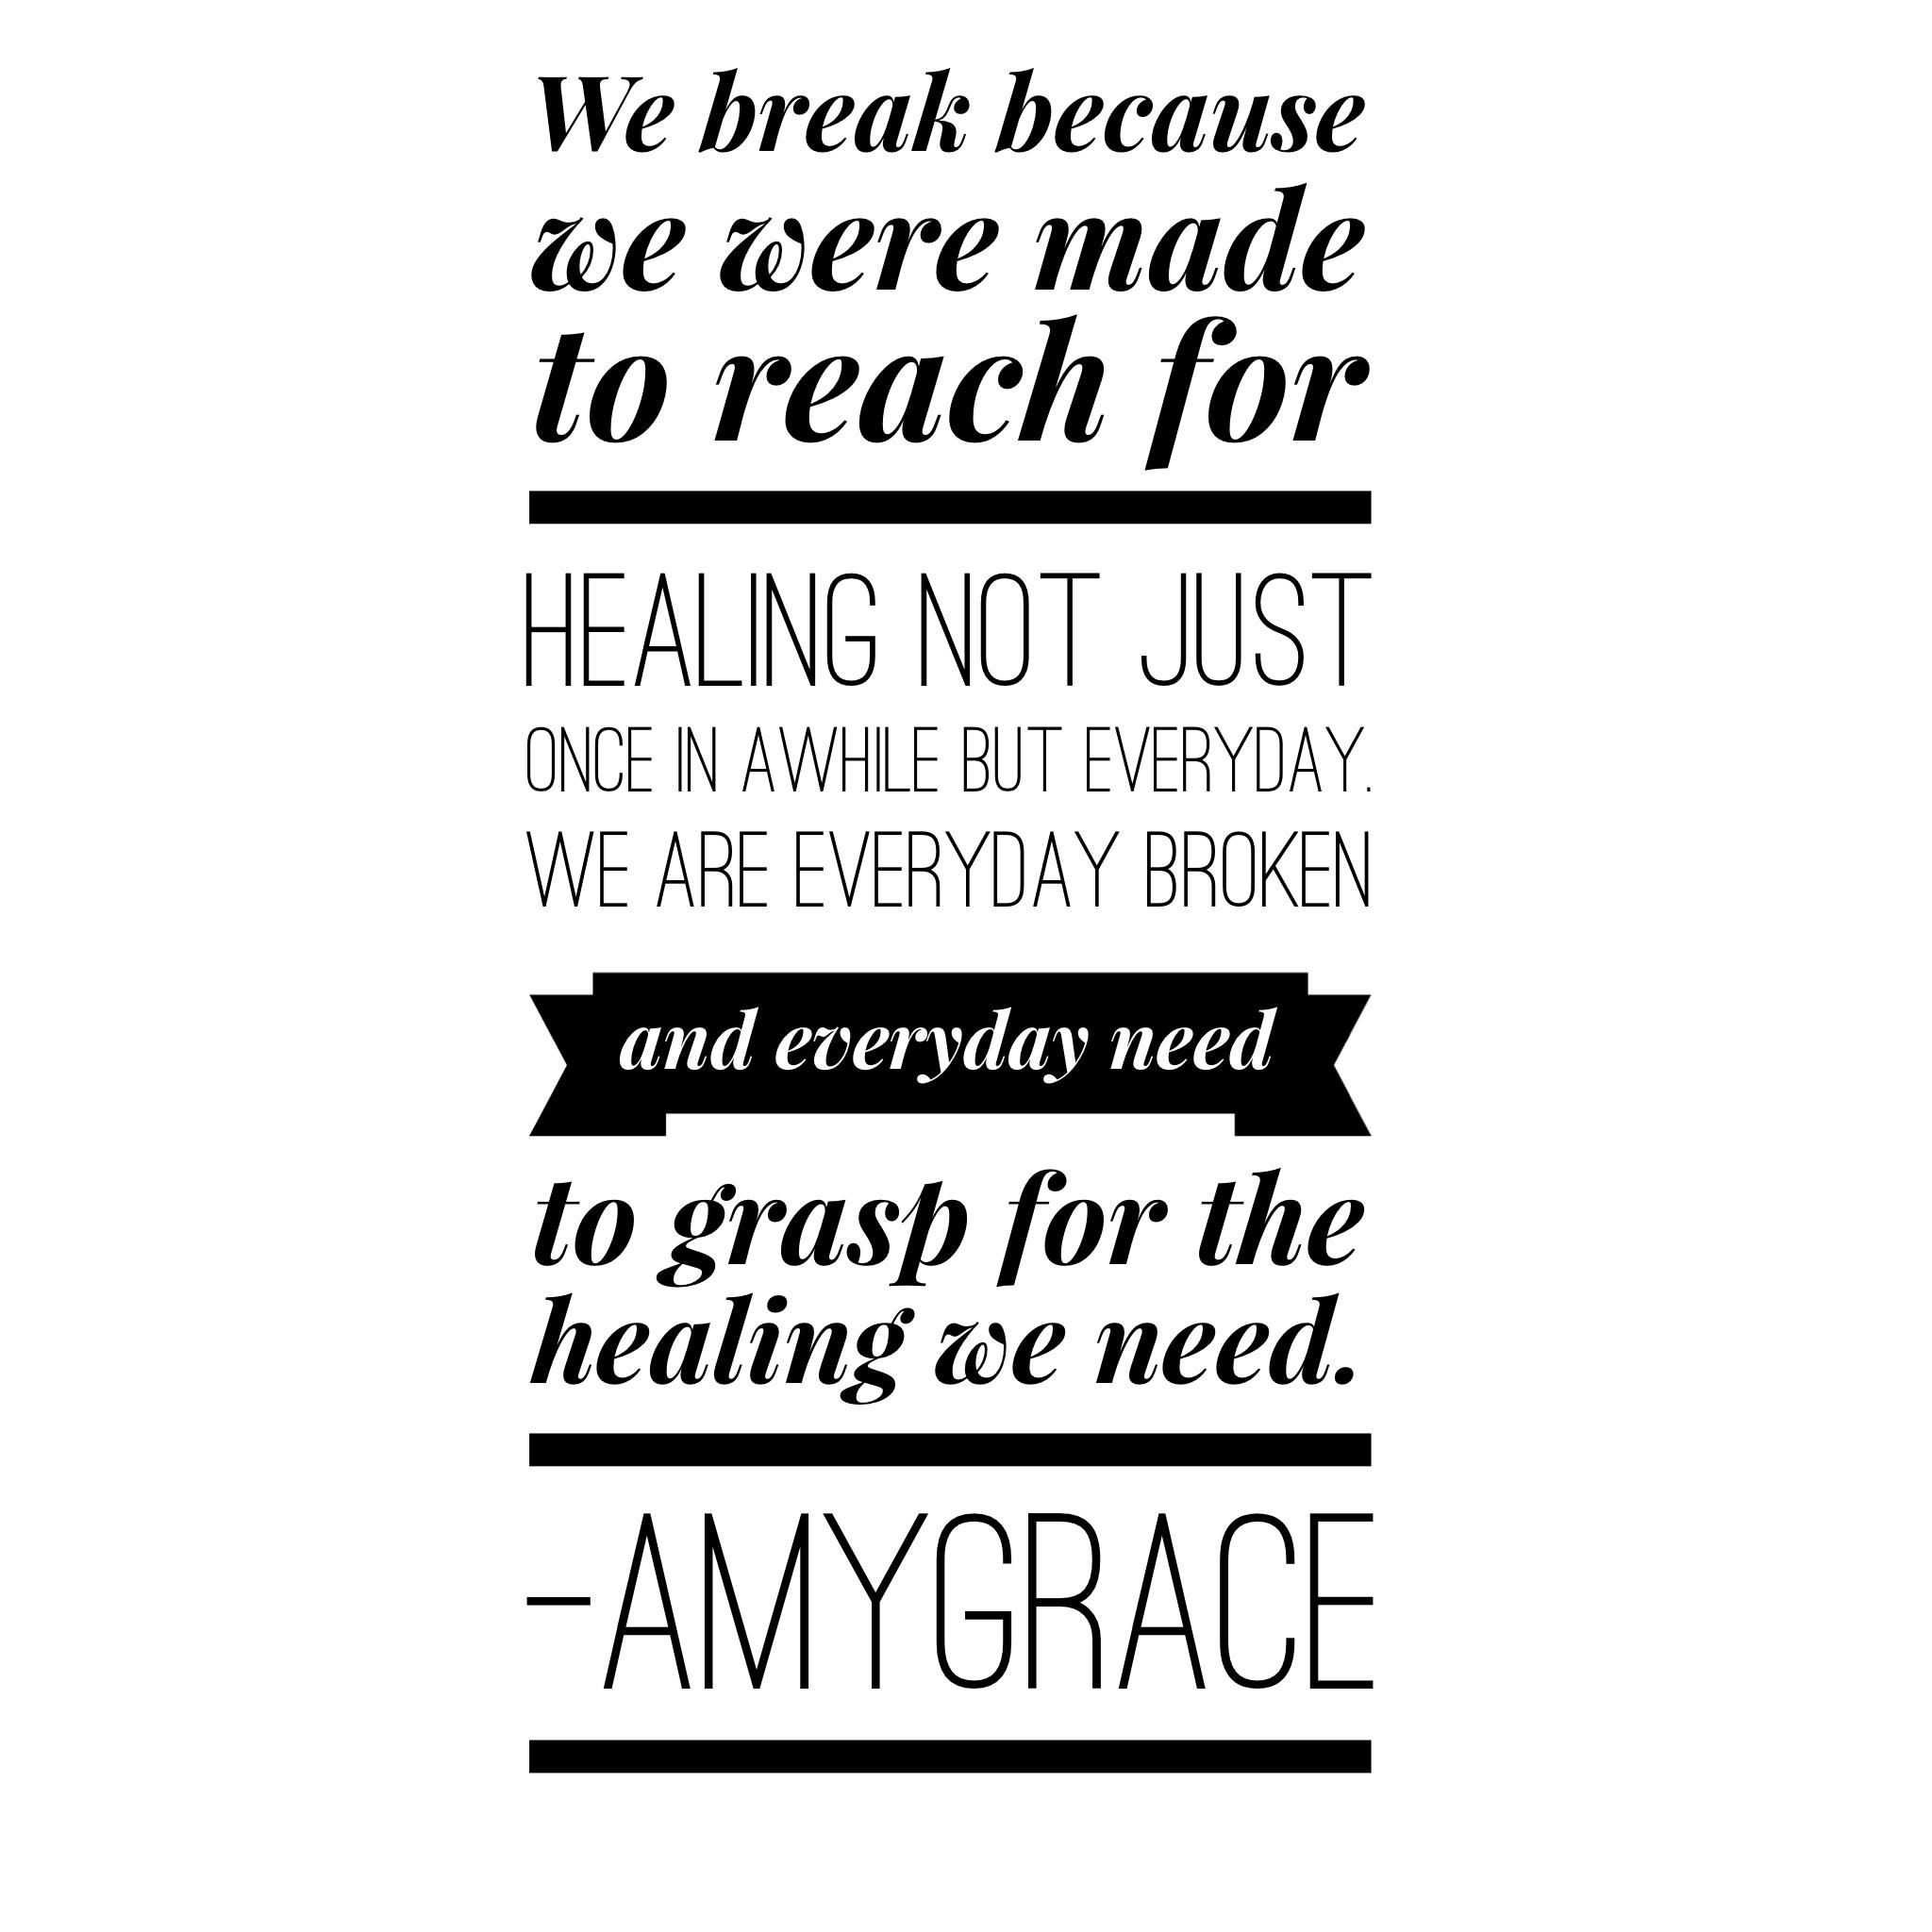 Healingbyamygrace